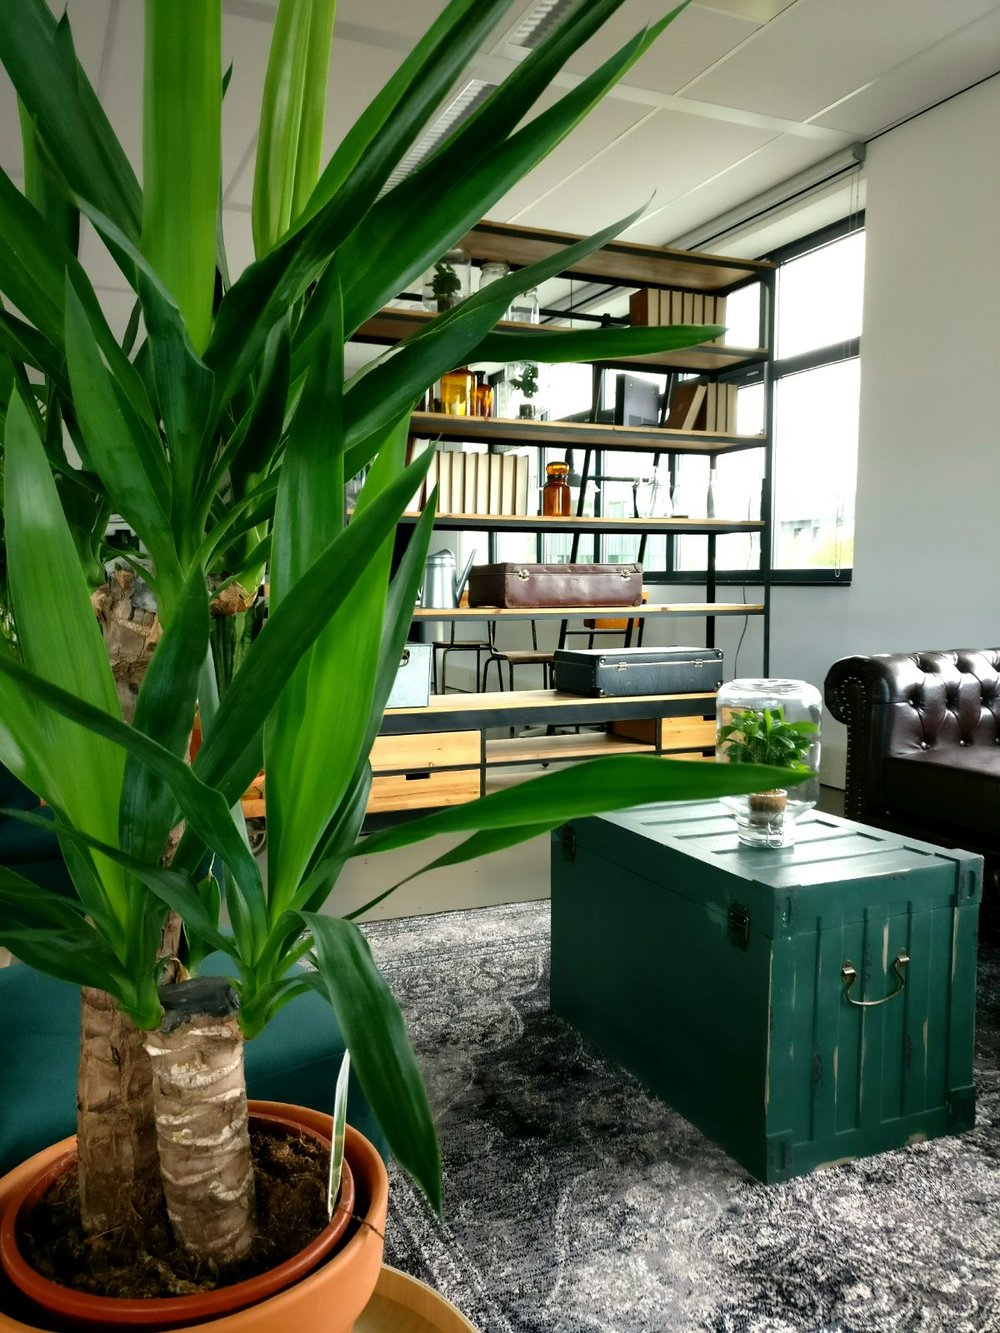 moderne kantoorruimte licht relaxhoek zithoek oude kist apothekersfles apothekerspot vintage display kast groene planten urban jungle.jpg